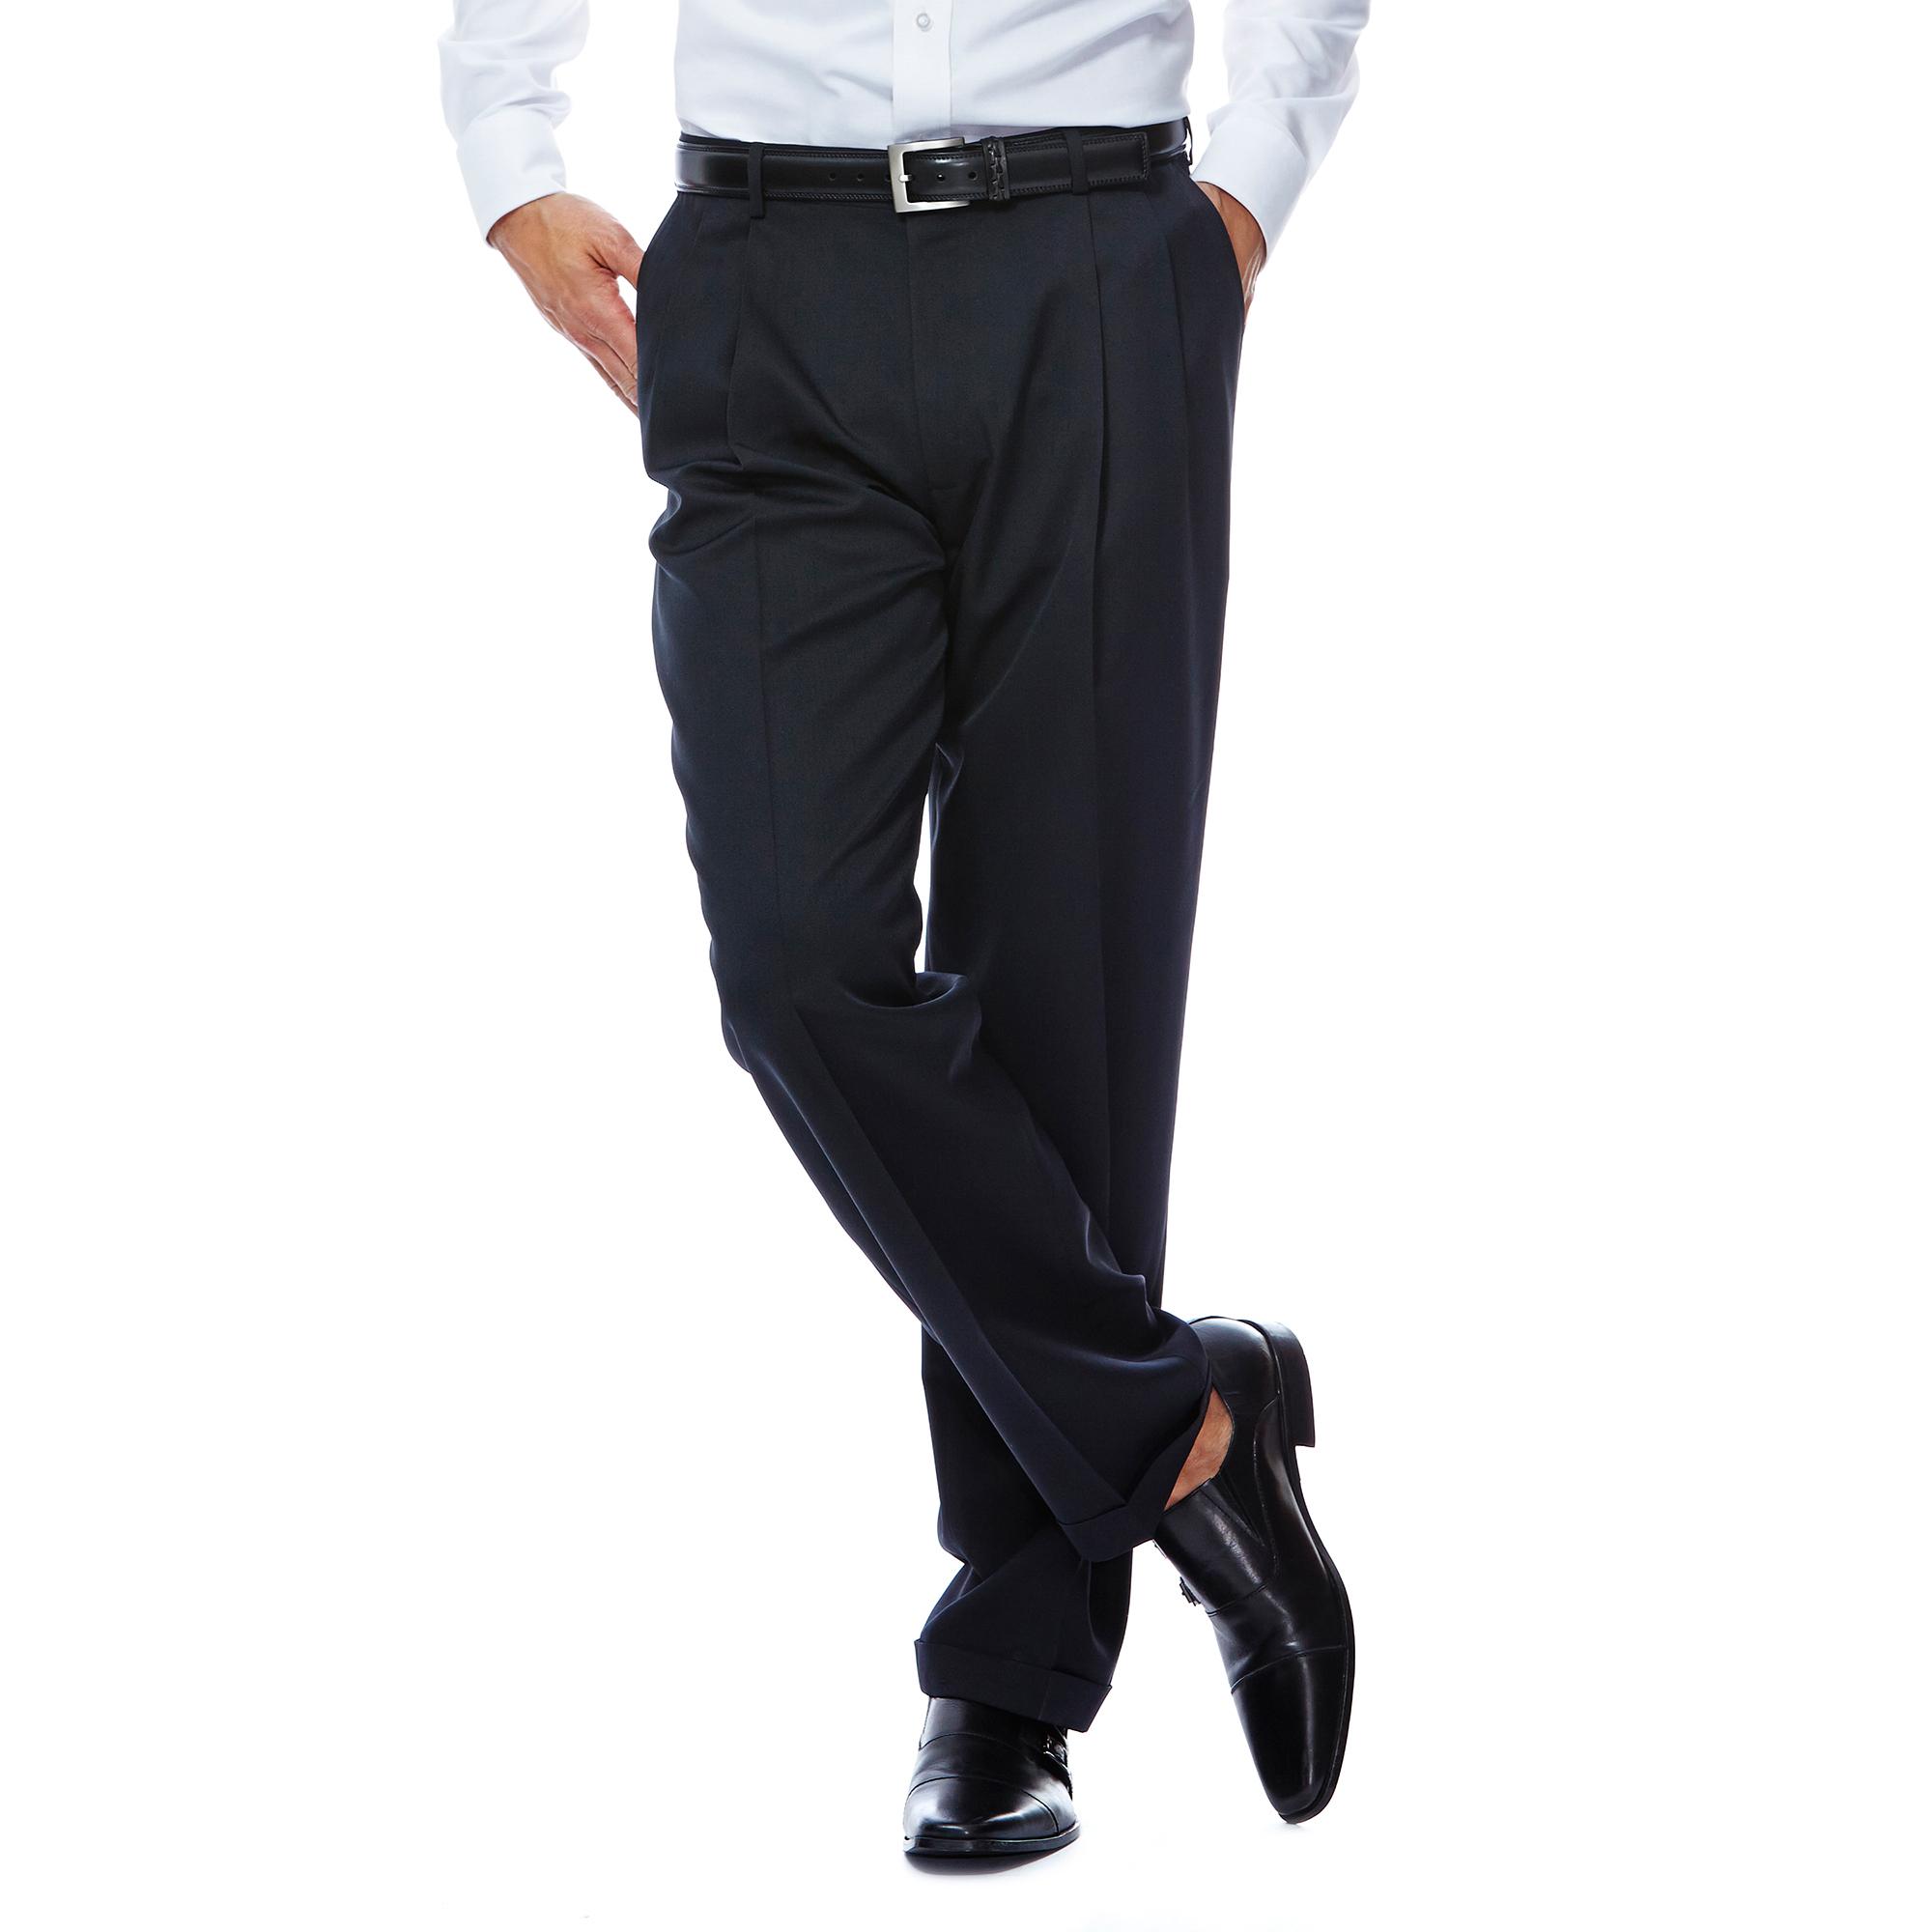 Haggar Men/'s Two-Tone Herringbone Expandable-Waist Pleat-Front Dress Pant